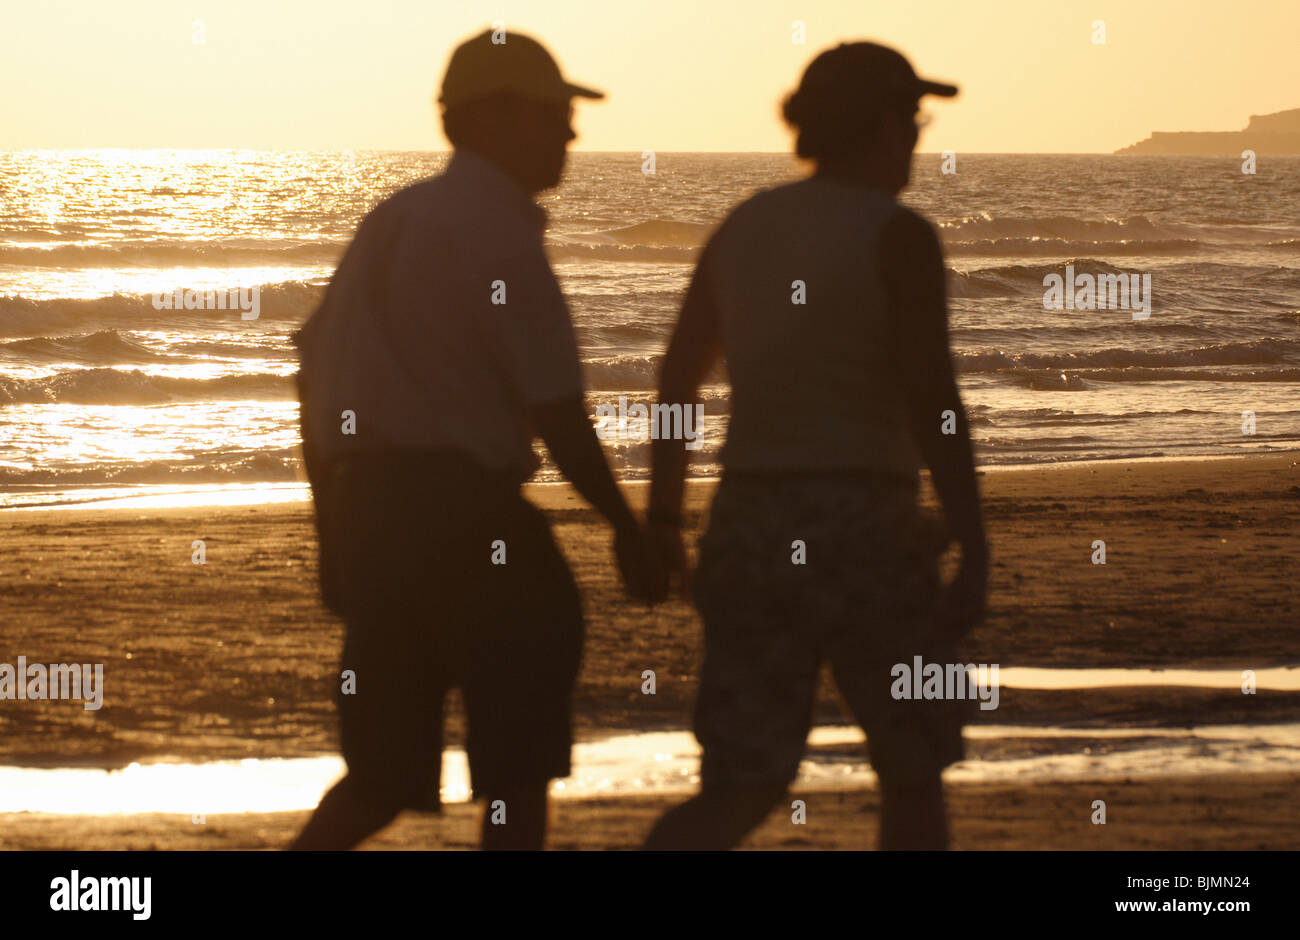 Elderly couple walking on a beach - Stock Image